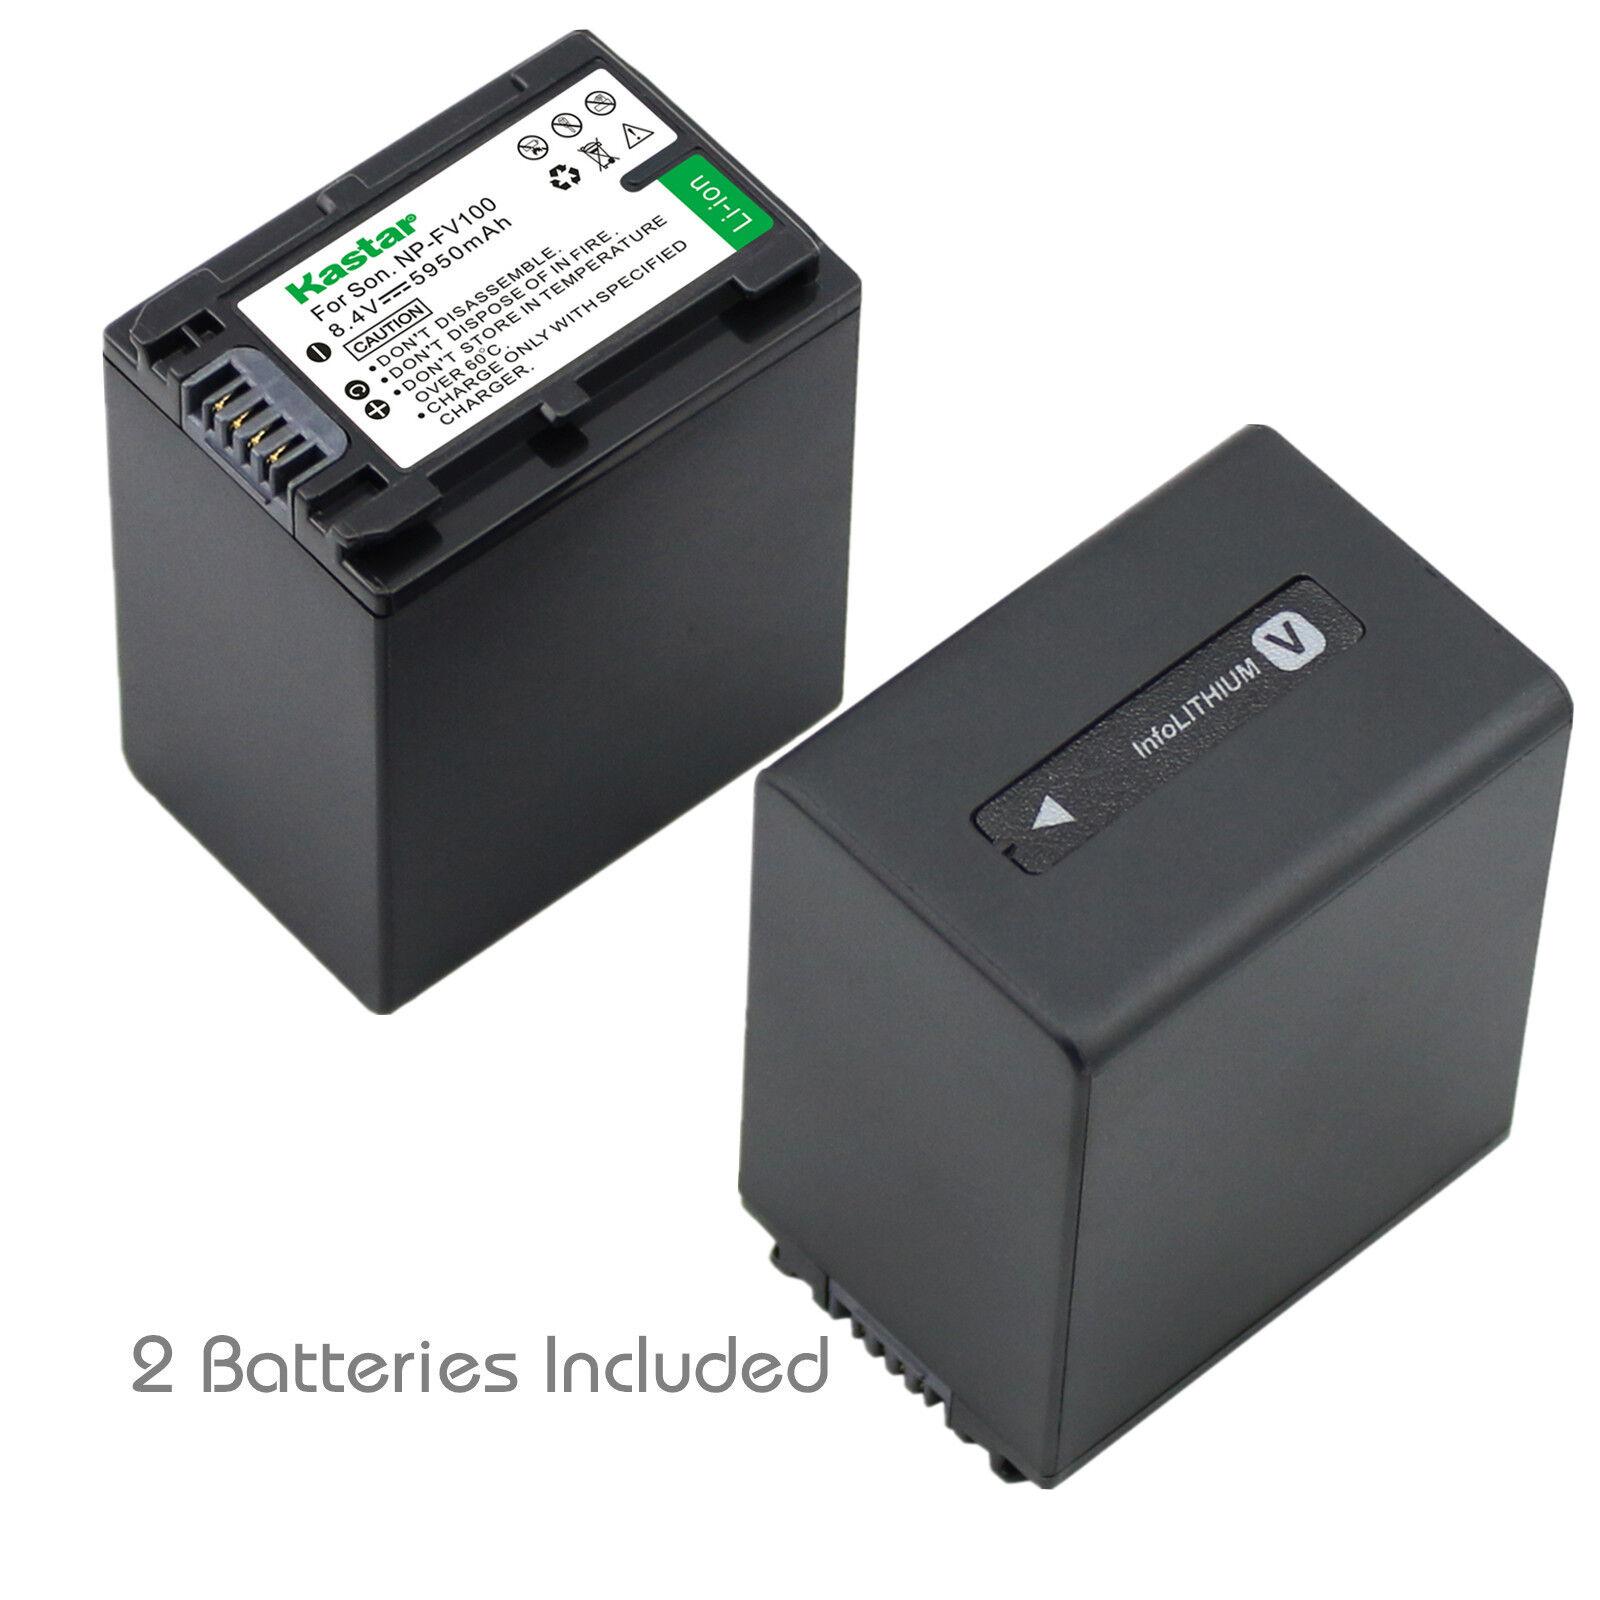 2x Kastar Battery For Sony Np-fv100 Hdr-pj710v Hdr-pj760v...